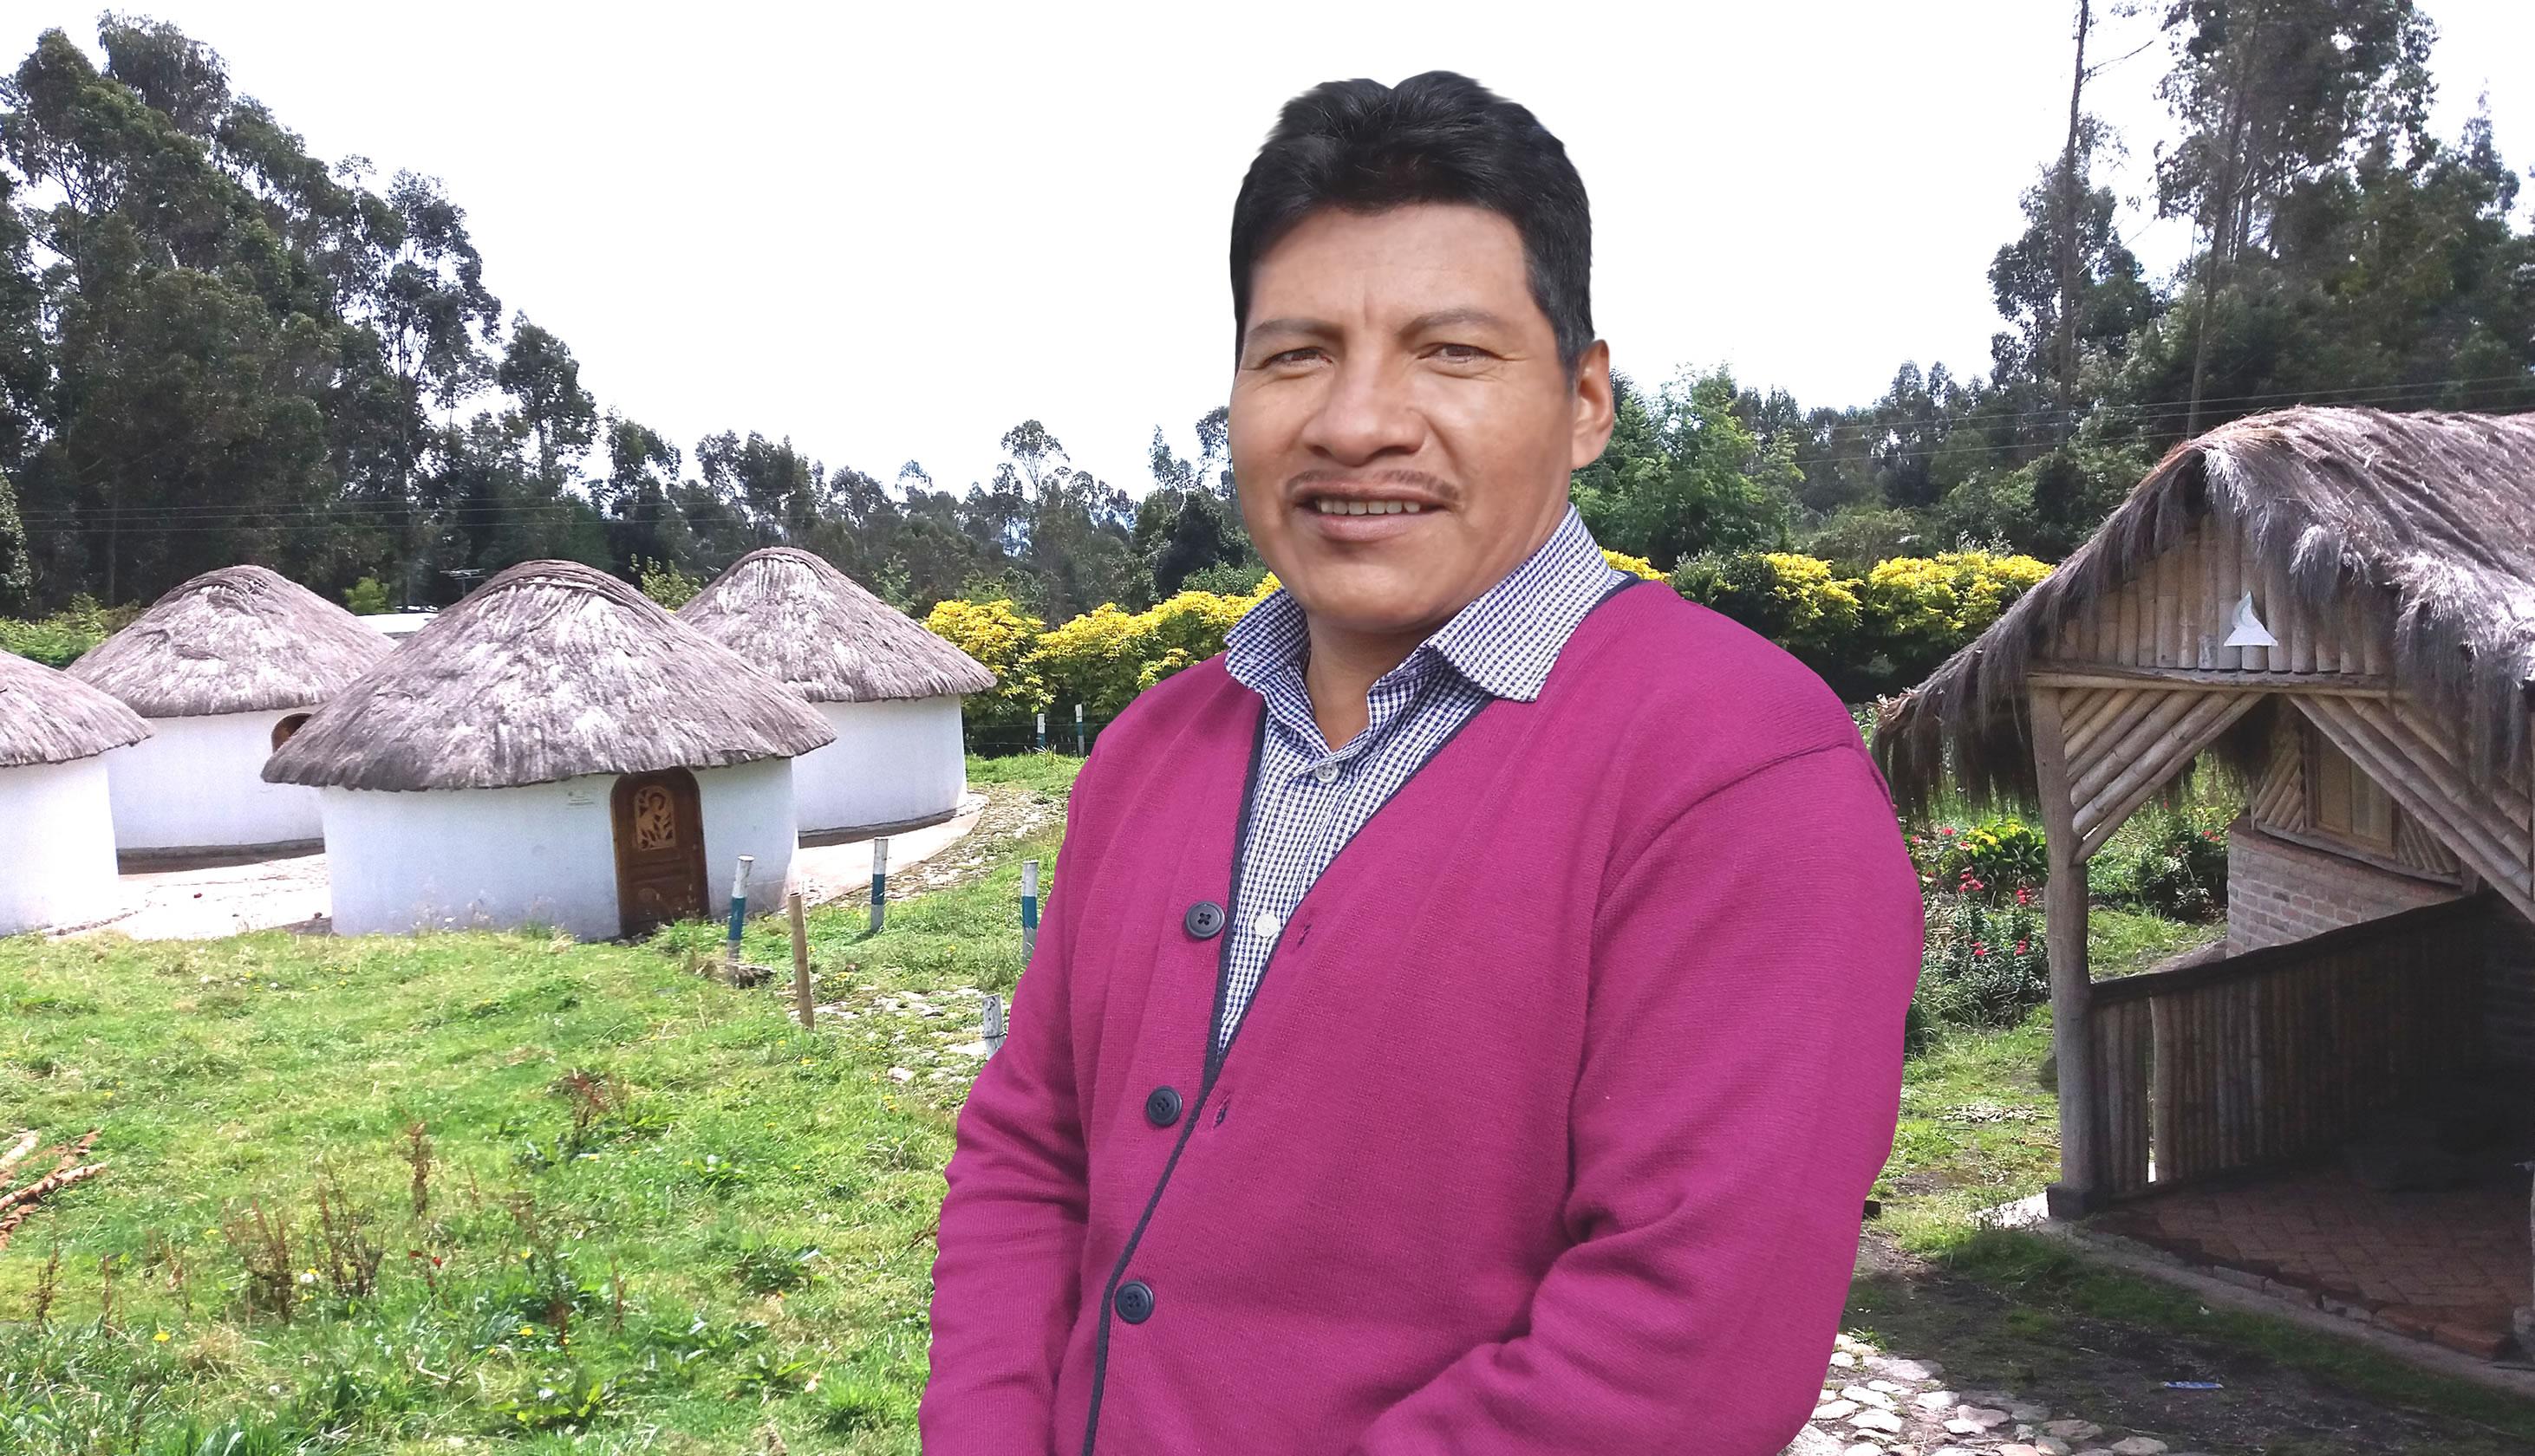 Rector Luis Iván Caipe Quenan